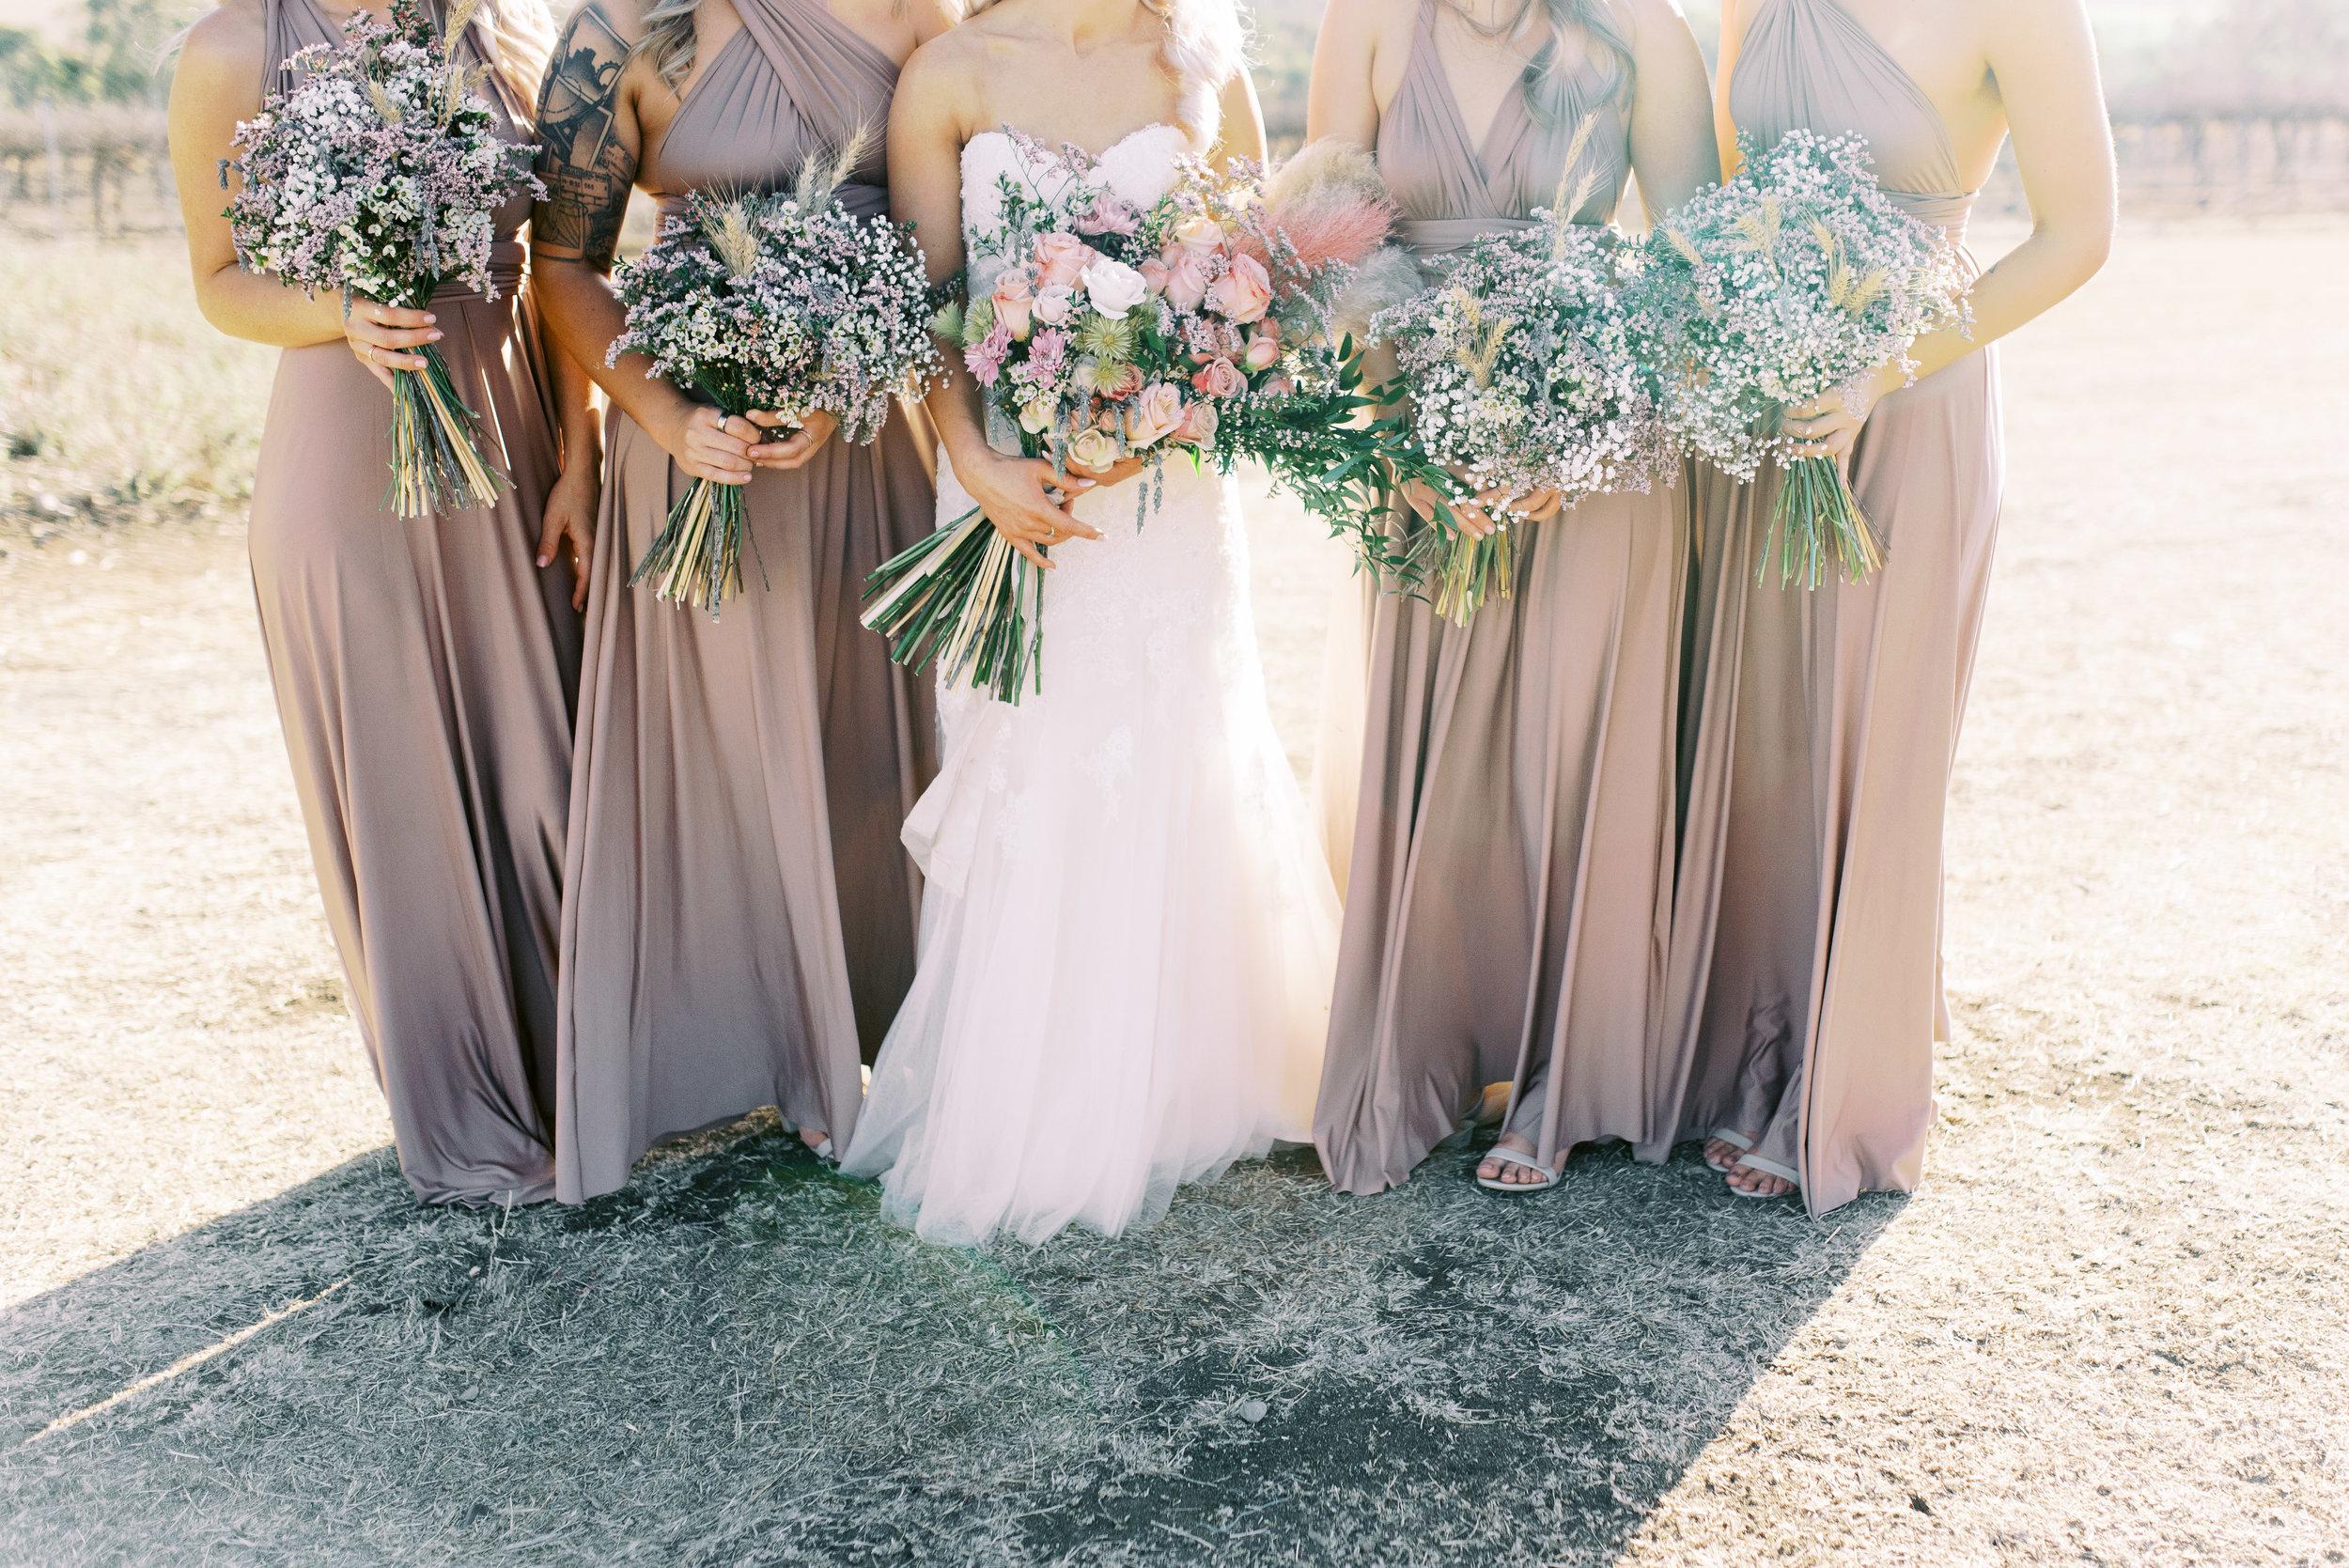 Kooroomba-Vineyard-Lavender-Farm-Wedding-Fine-Art-Lauren-Olivia-54.jpg